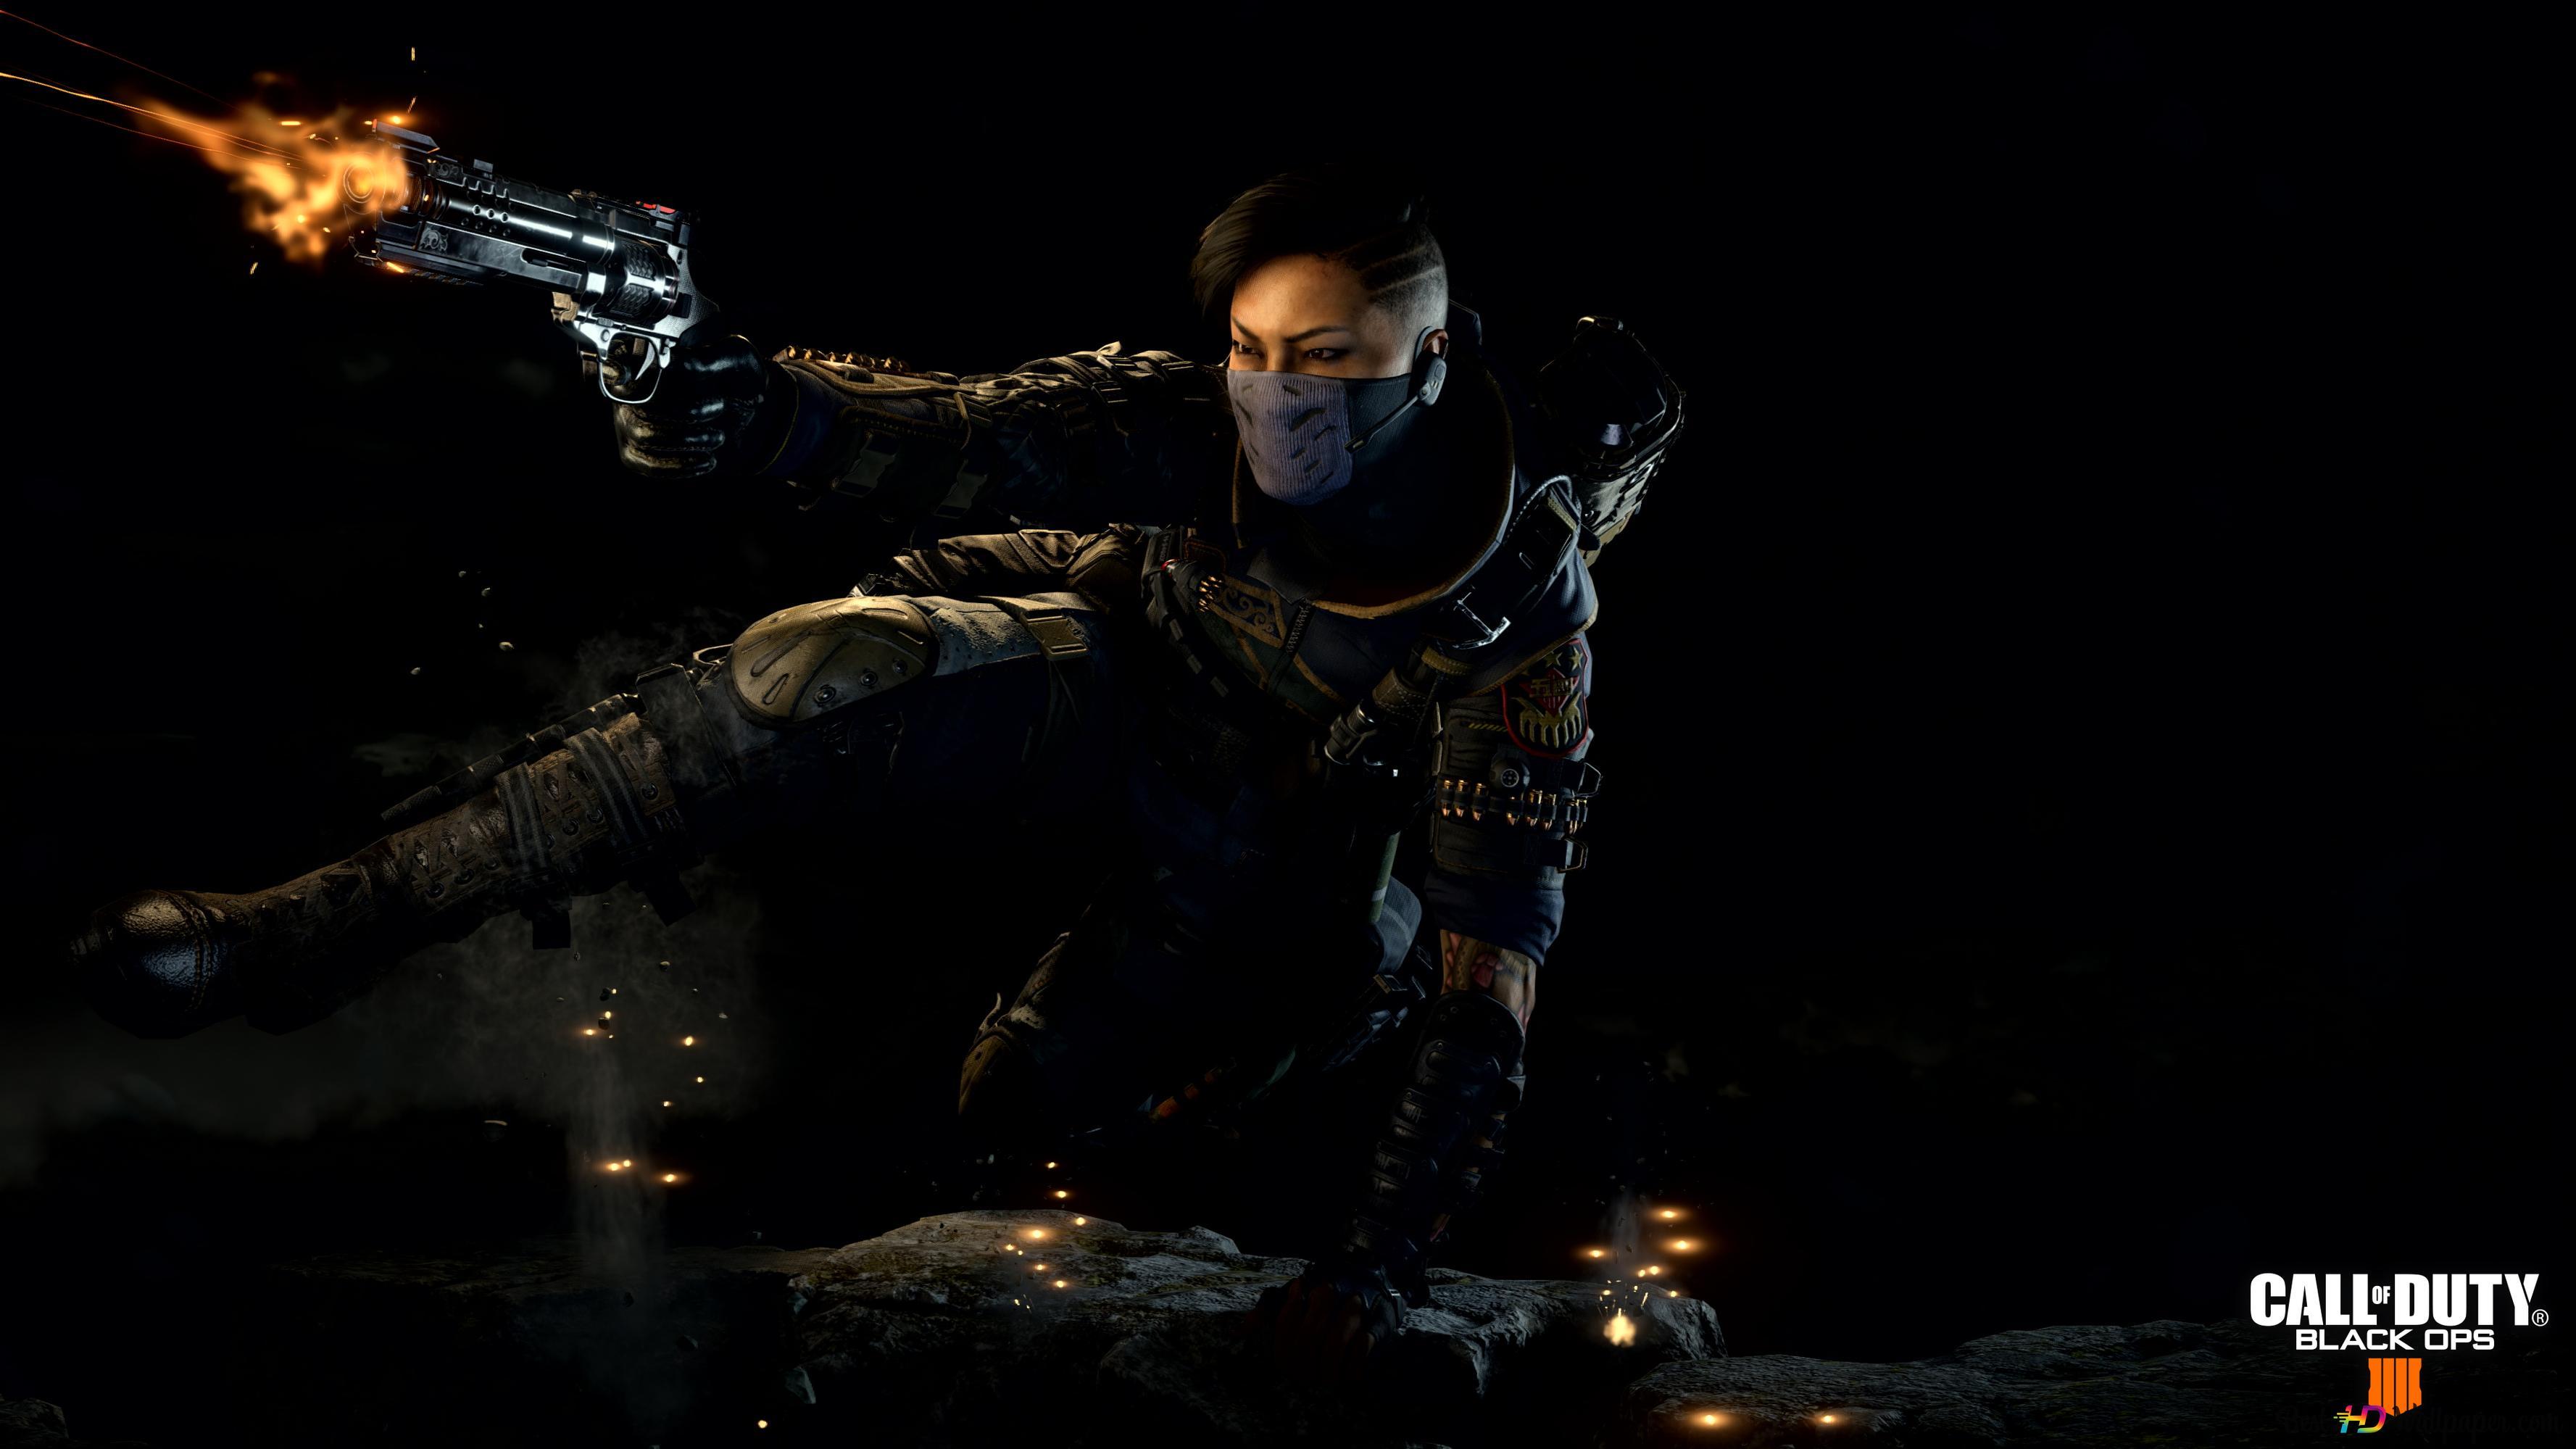 Seraph Call Of Duty Black Ops 4 Hd Wallpaper Download